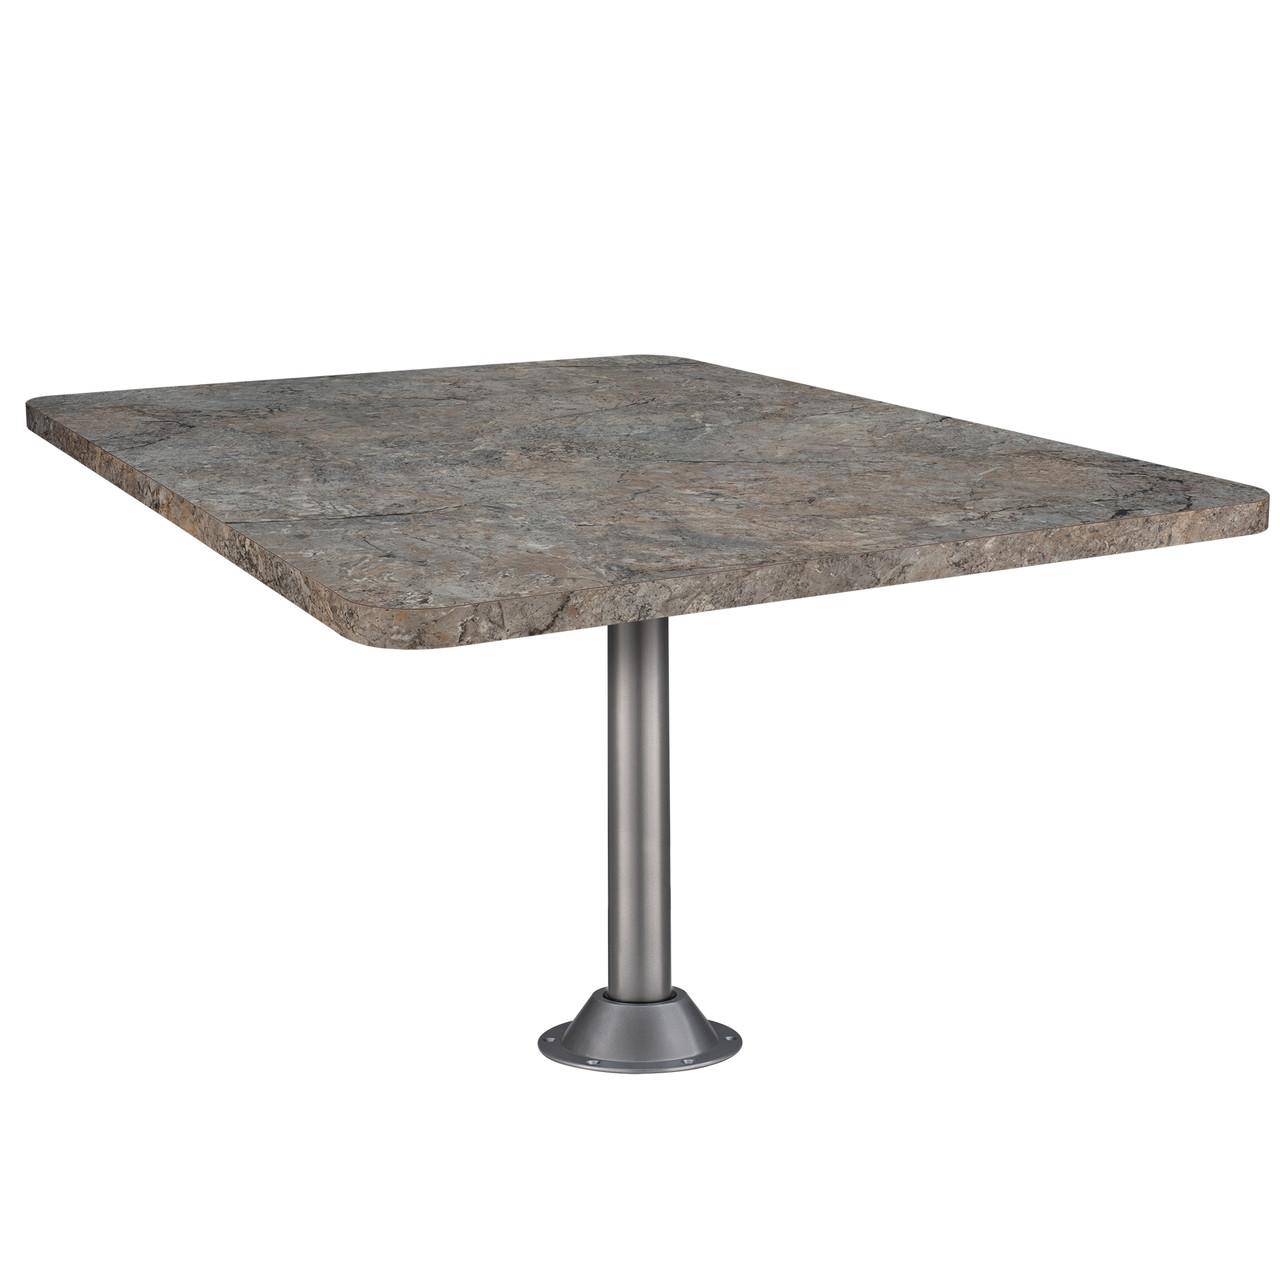 RecLite LS RV Dinette Table 38